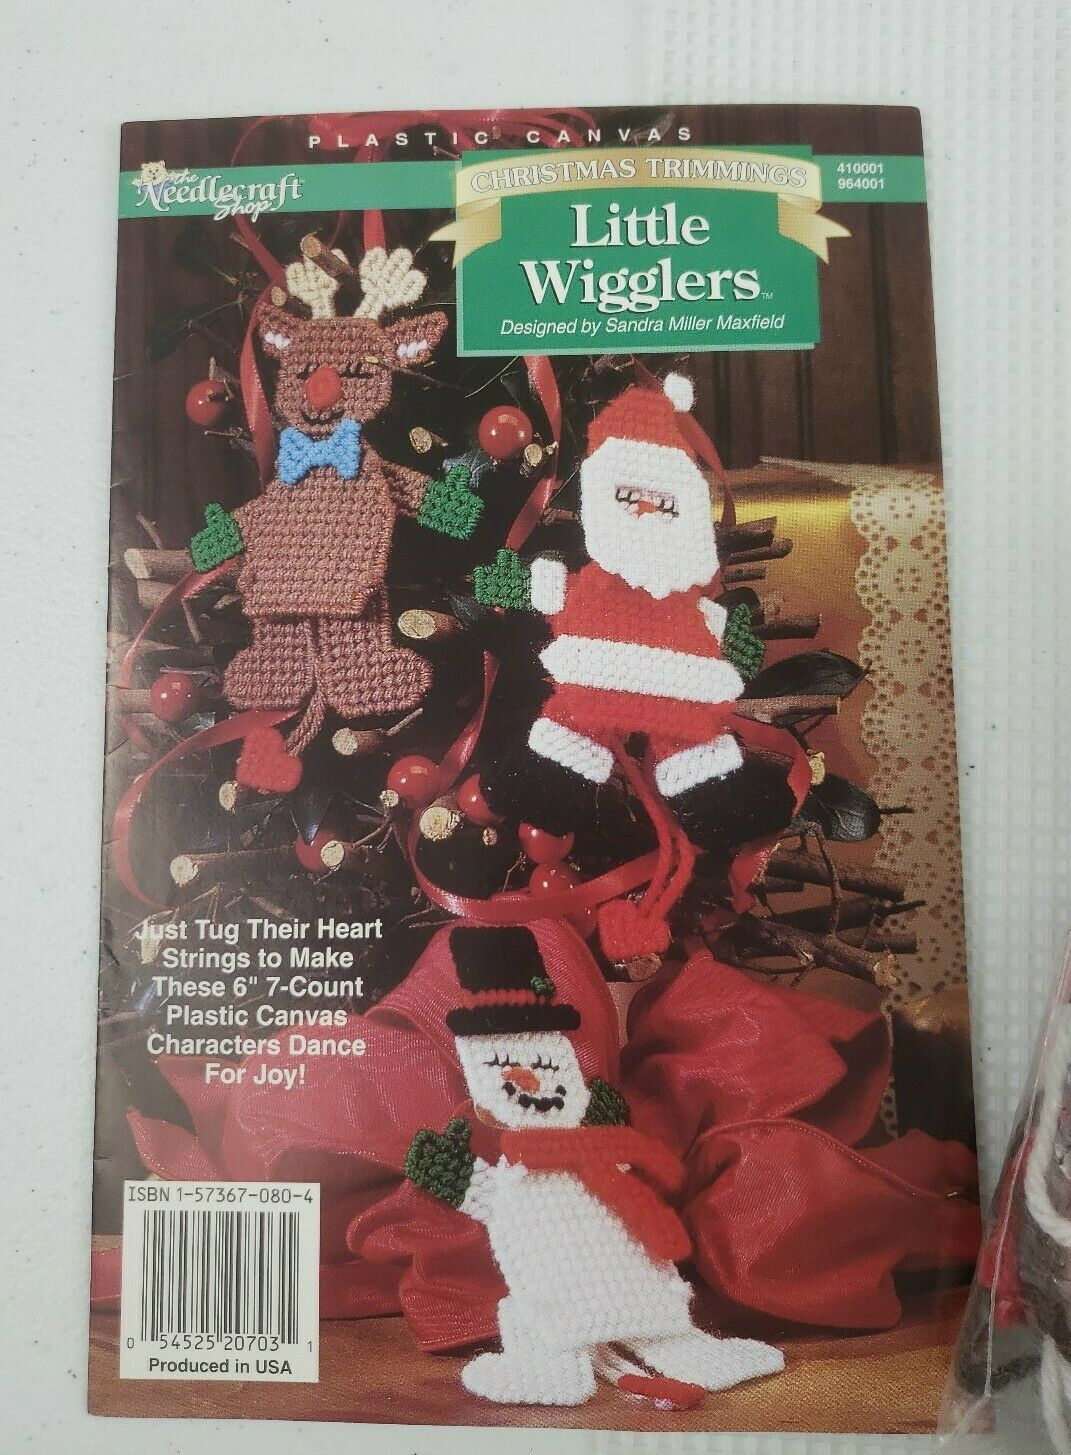 1996 Needlecraft Plastic Canvas Little Wigglers Christmas Cross Stitch Kit CUTE - $8.50